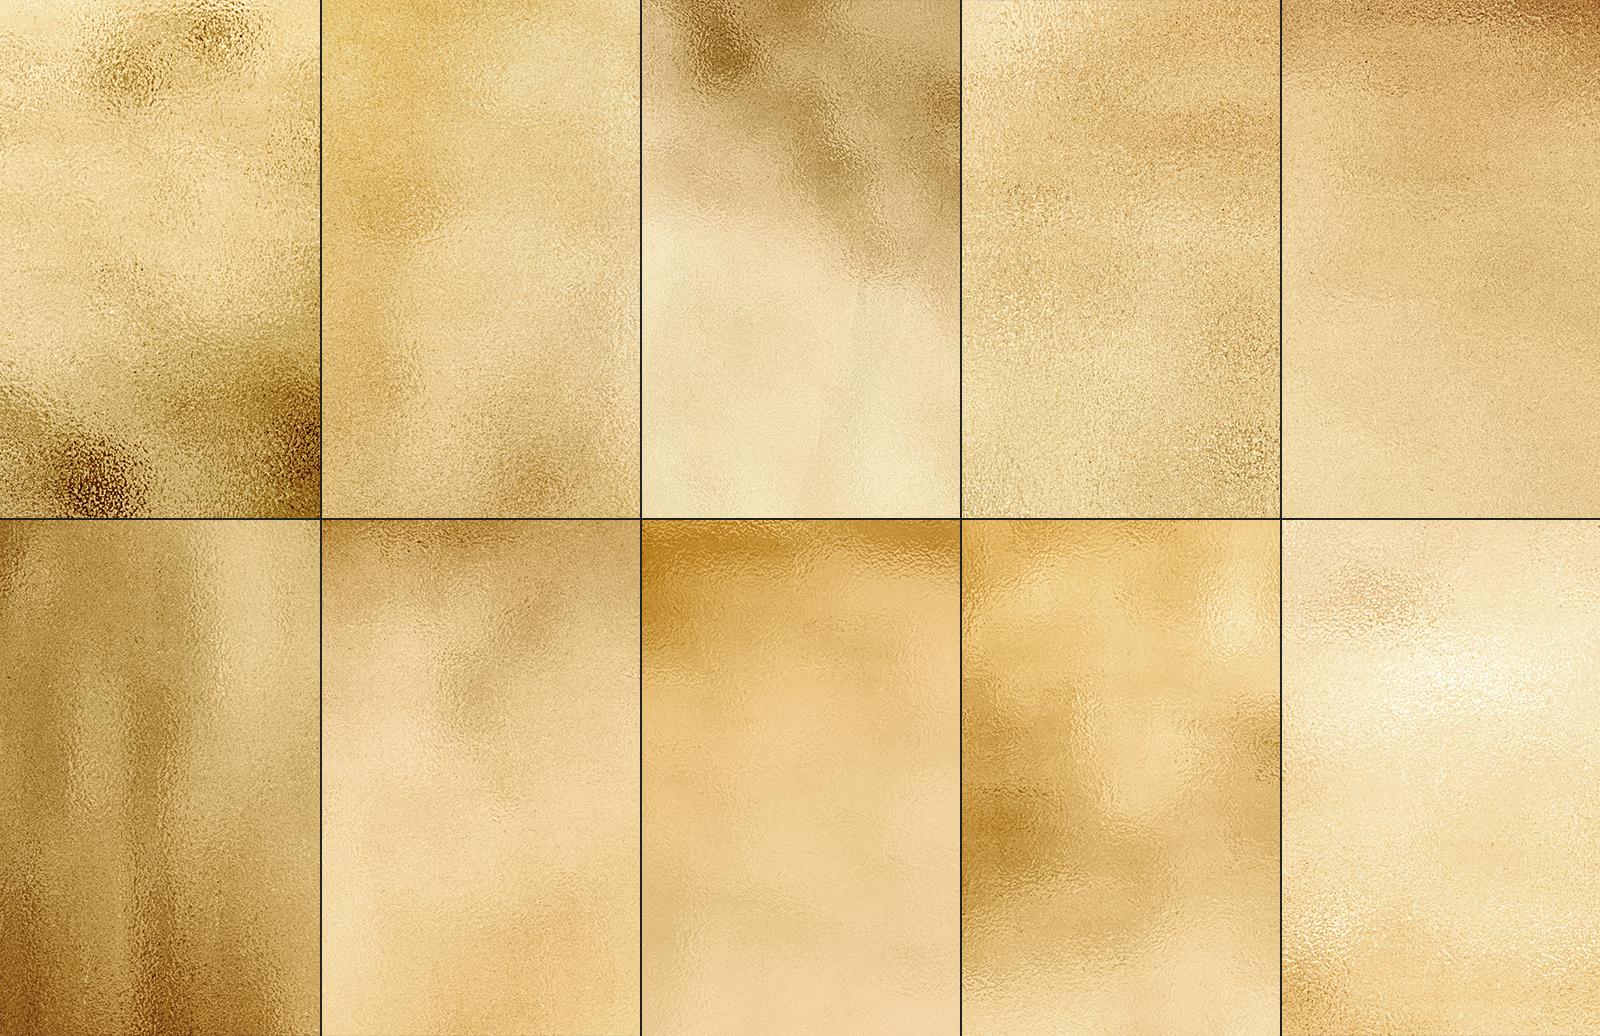 Gold & Silver Foil Textures 2